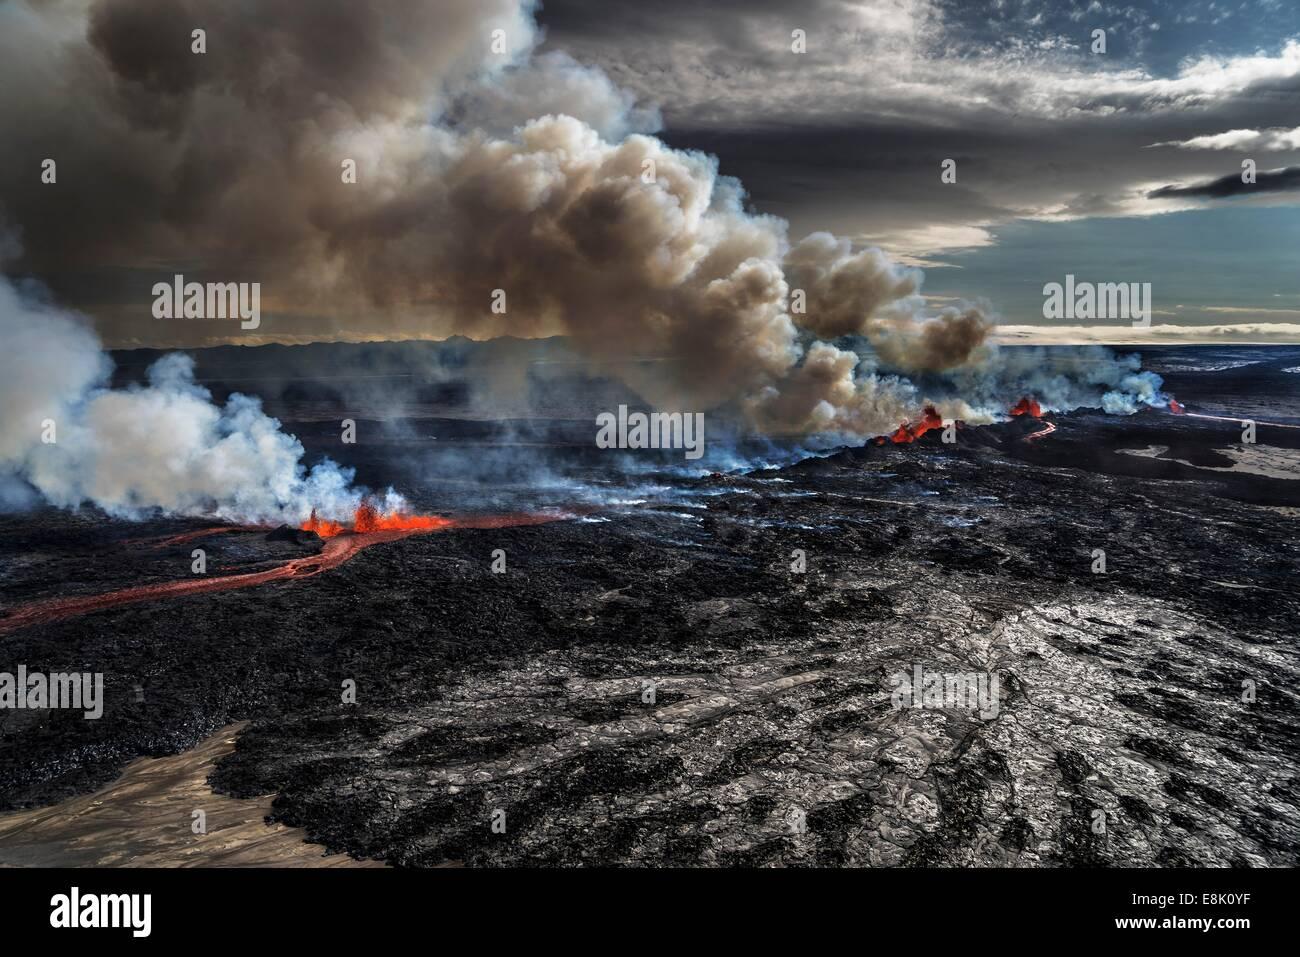 Volcano Eruption at the Holuhraun Fissure near the Bardarbunga Volcano, Iceland. Stock Photo